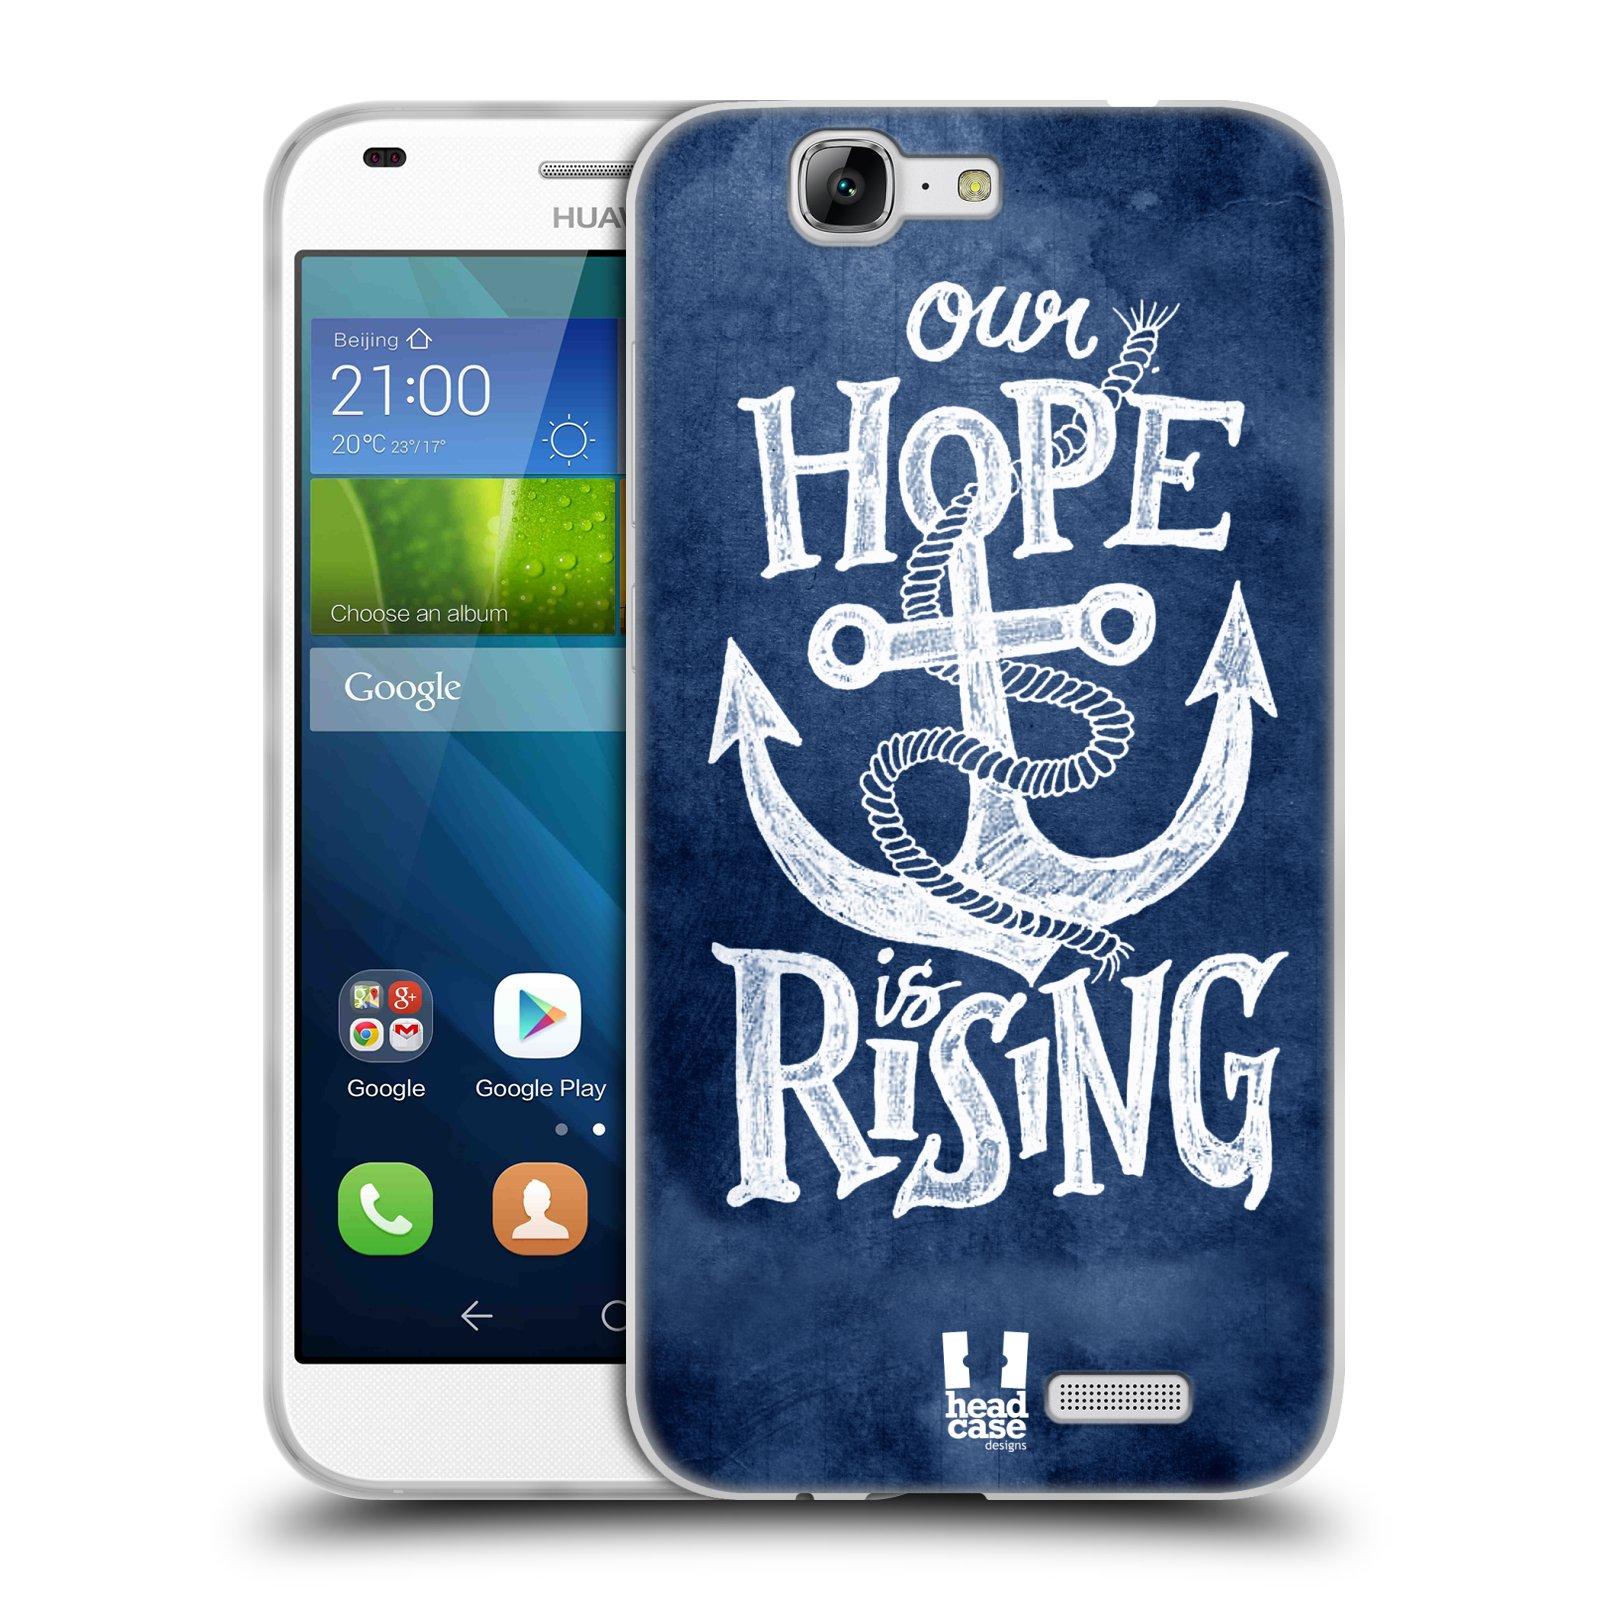 Silikonové pouzdro na mobil Huawei Ascend G7 HEAD CASE KOTVA RISING